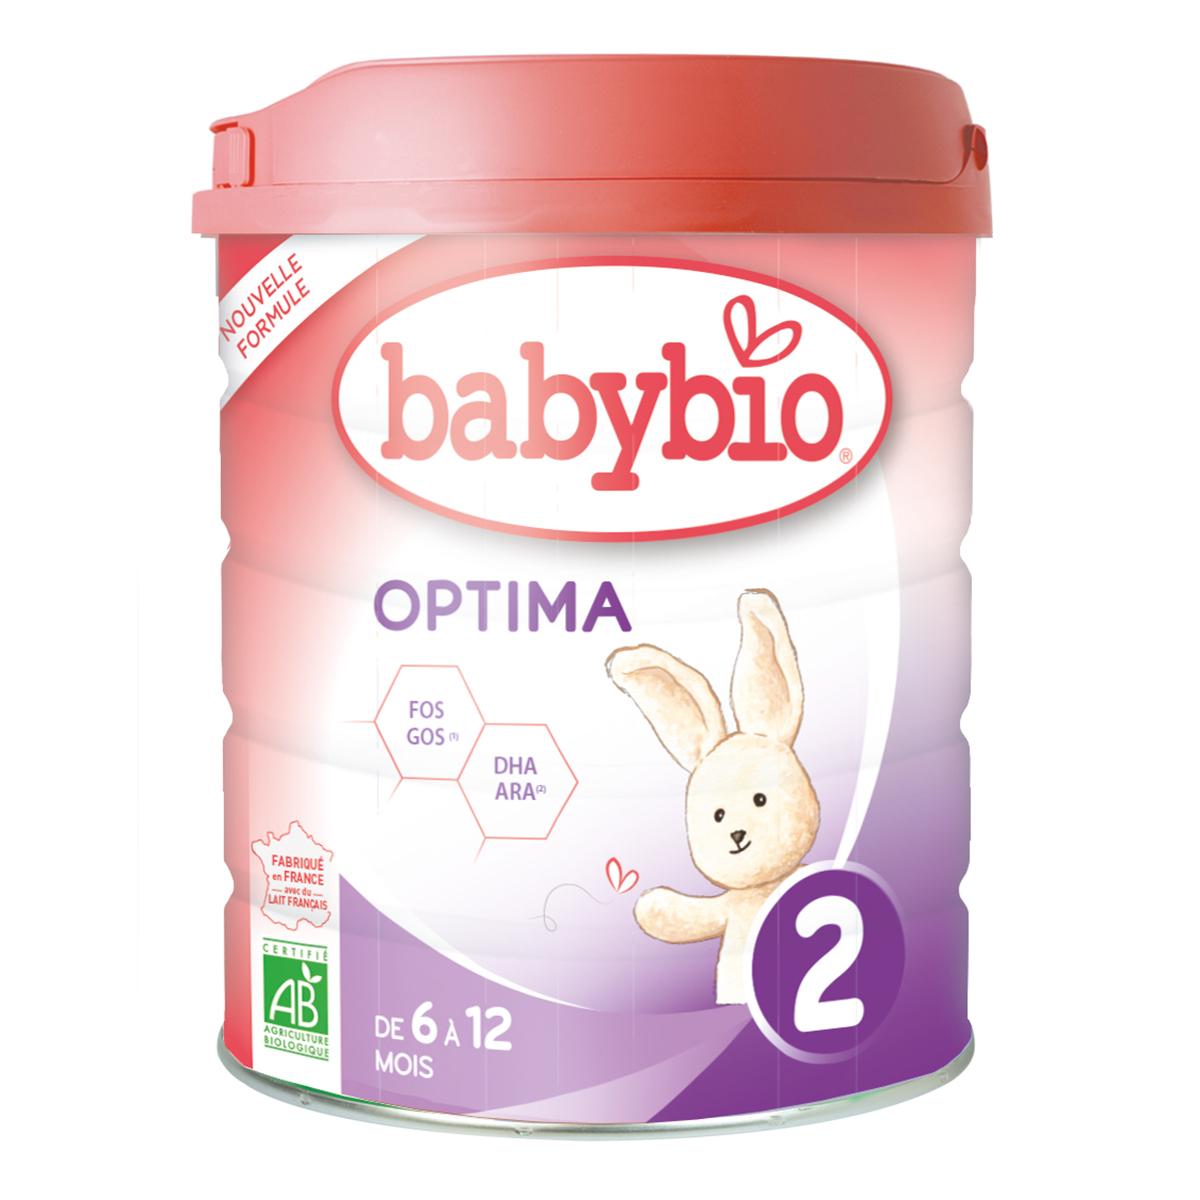 babybio 58032 1108002